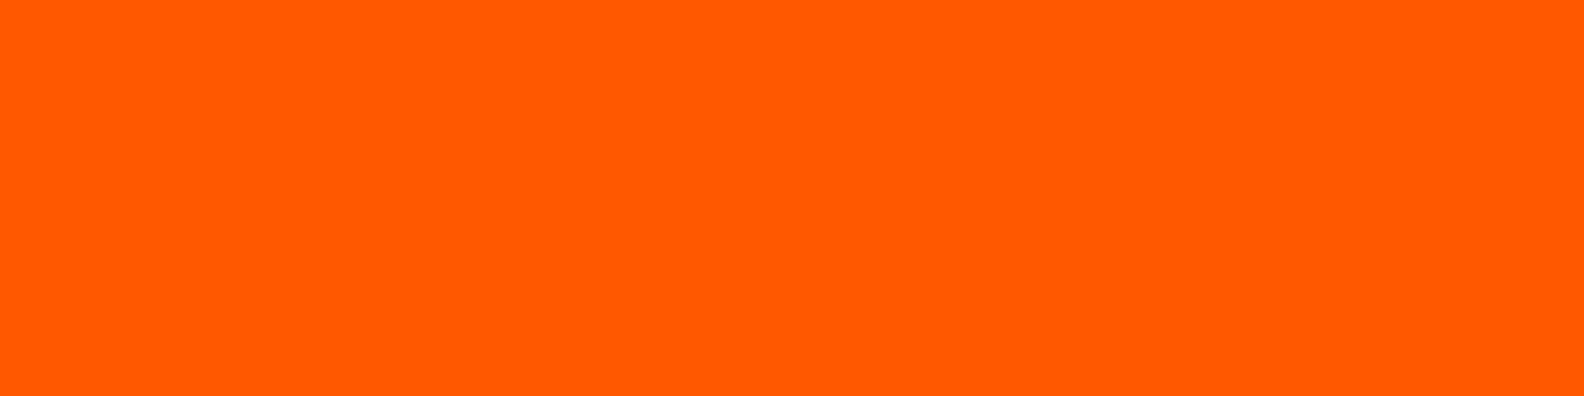 1584x396 Orange Pantone Solid Color Background